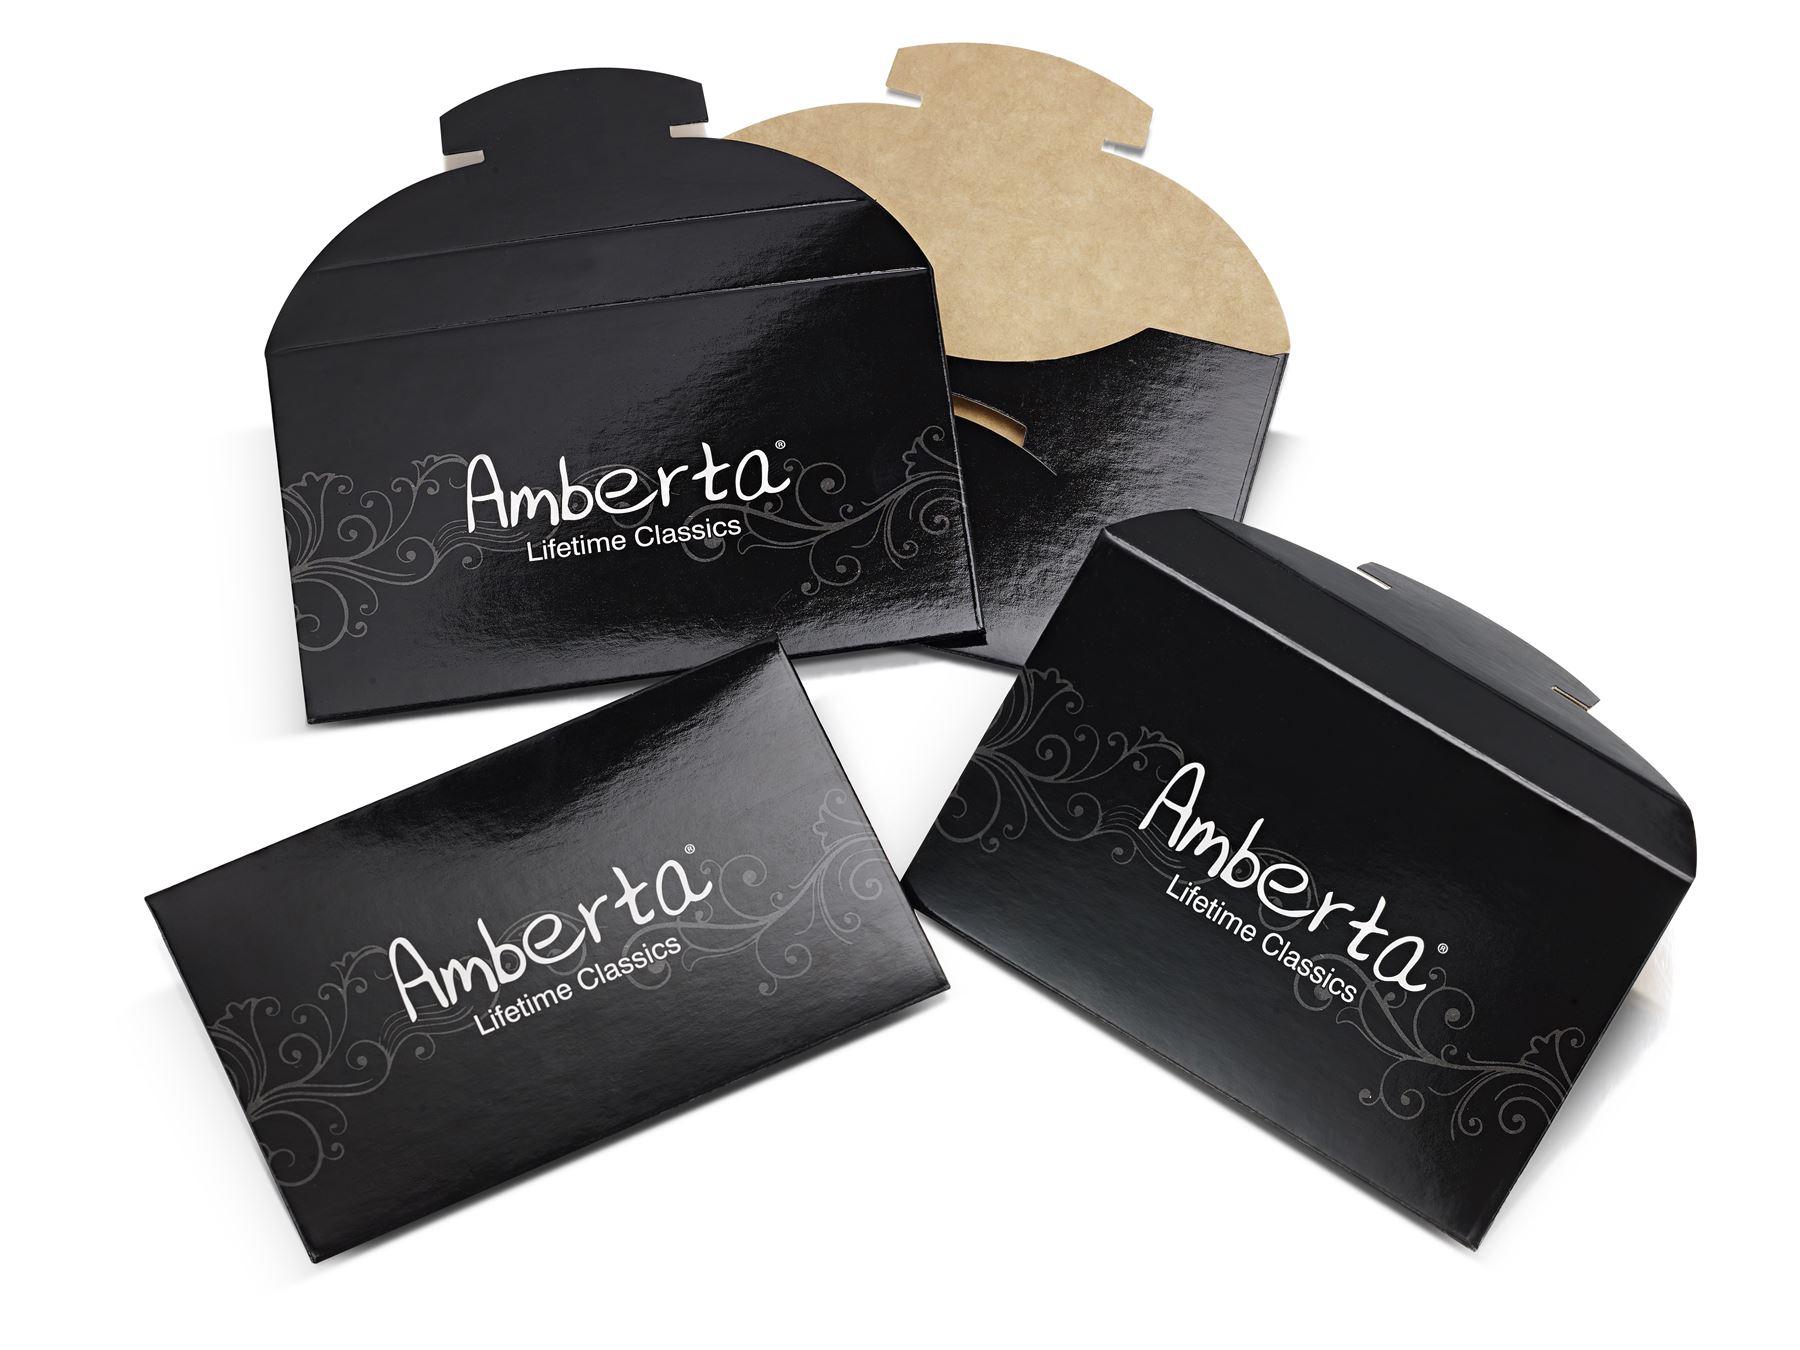 Amberta-Jewelry-925-Sterling-Silver-Adjustable-Bracelet-Italian-Bangle-for-Women thumbnail 76